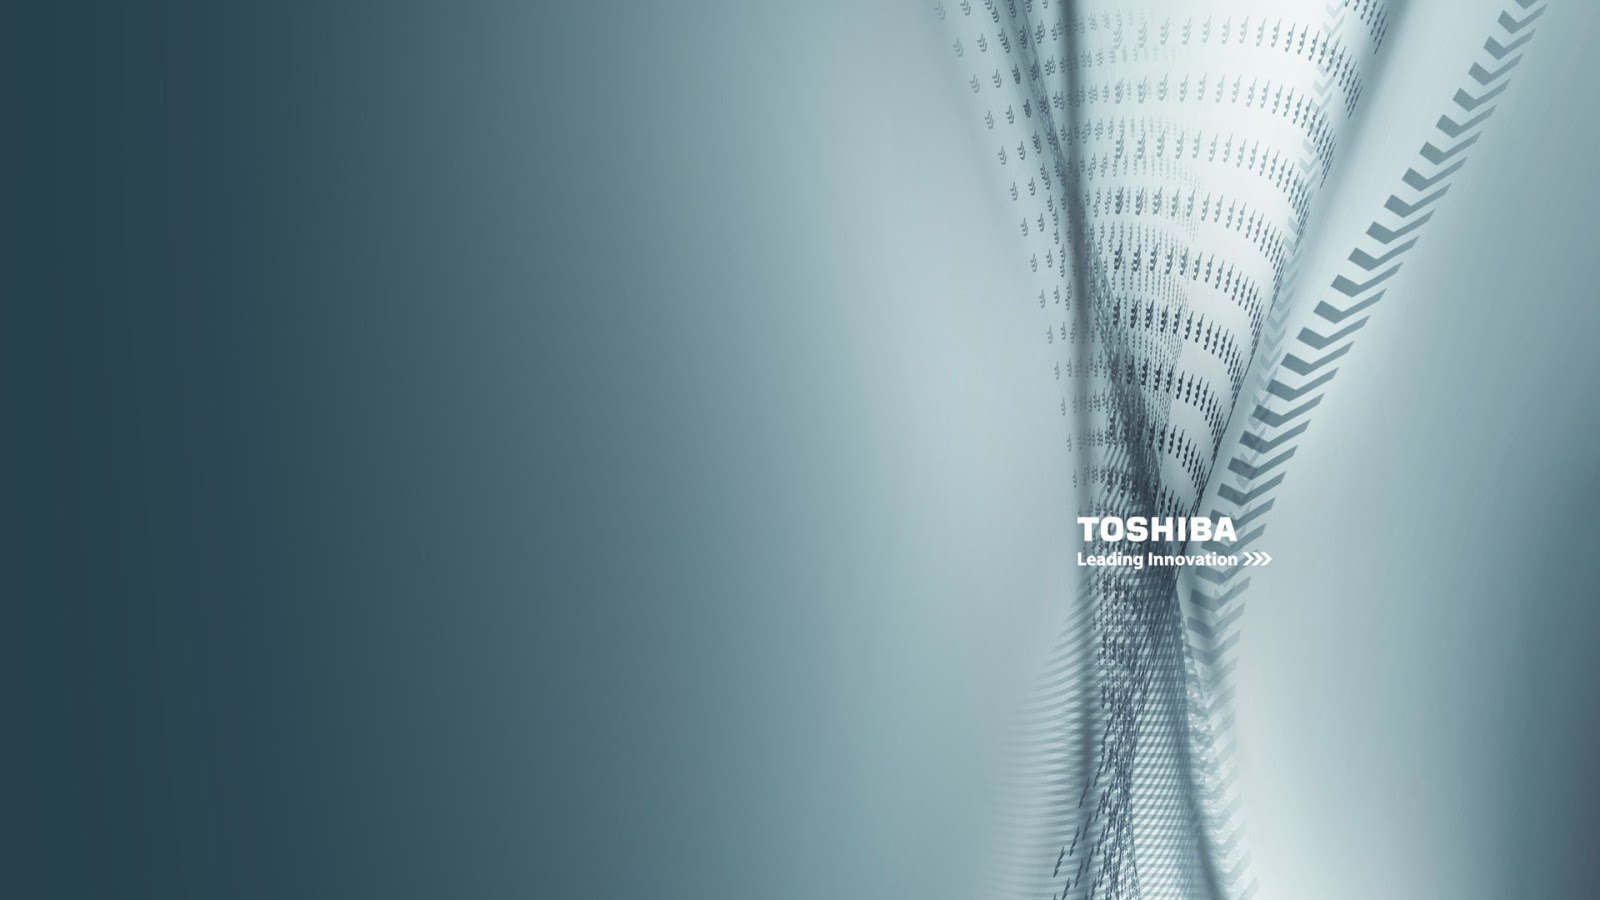 Toshiba Computer Desktop HD Images Download